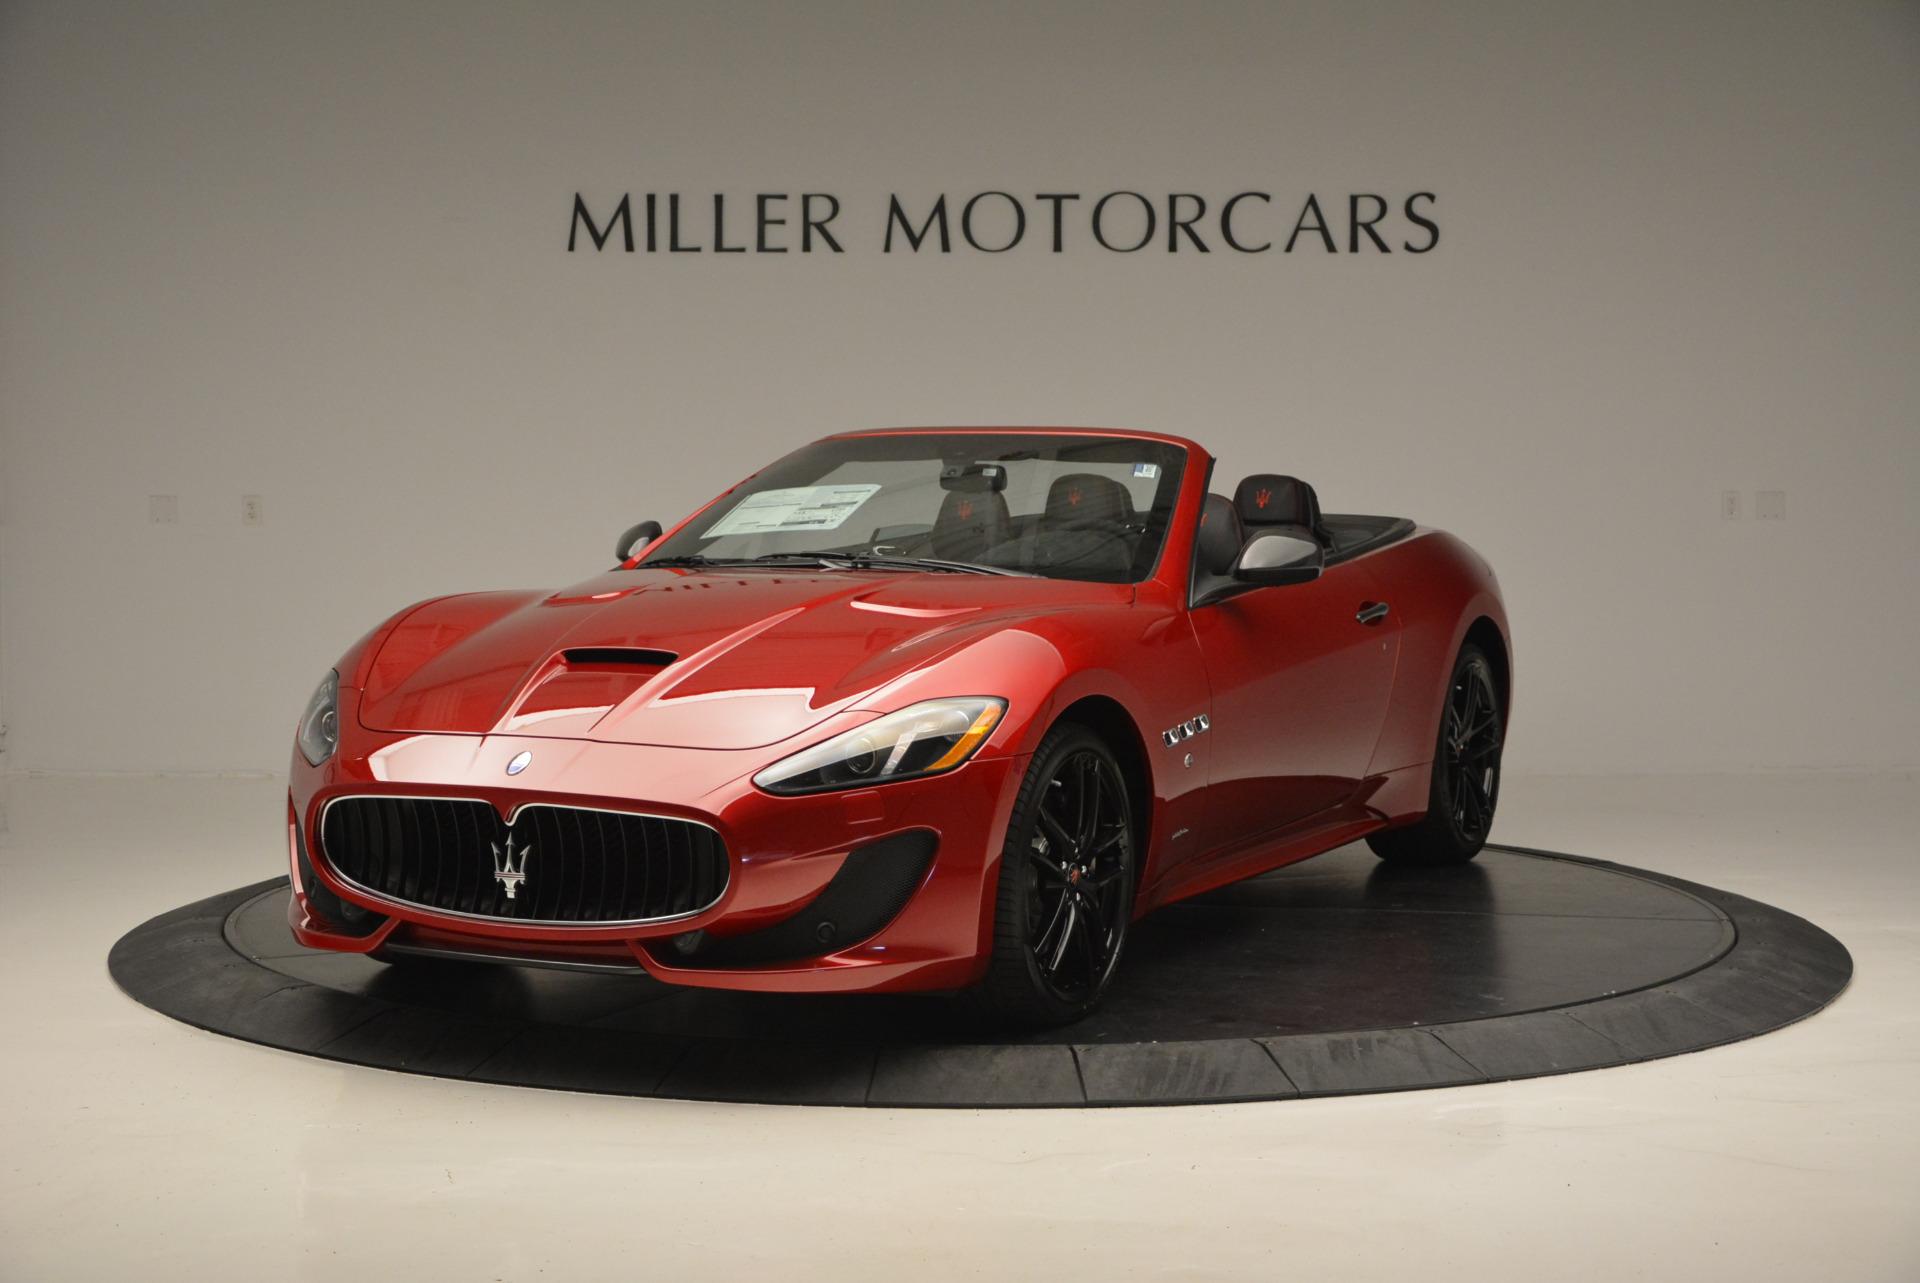 New 2017 Maserati GranTurismo Sport Special Edition For Sale In Westport, CT 666_main